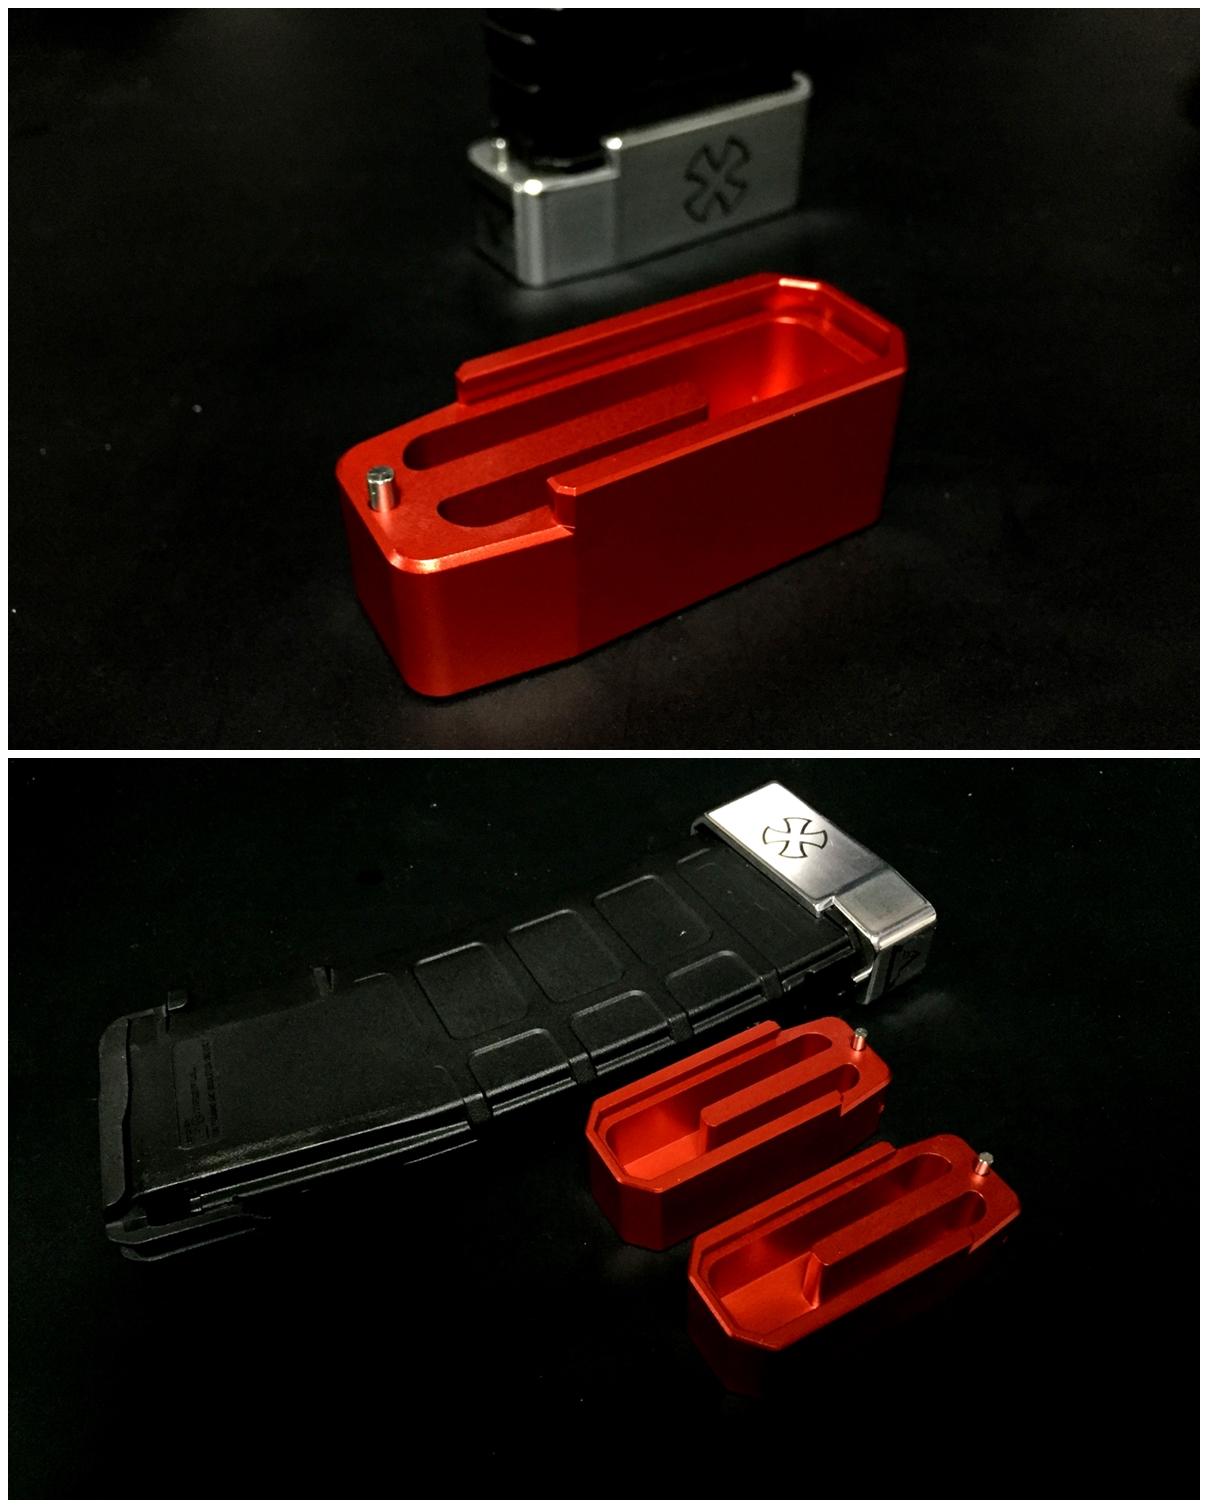 3 UAC P-MAG TTI TYPE アルミ ベース パッド 追加 購入 & TTI NOVESKE DIY LASER 刻印 加工 取付 レビュー